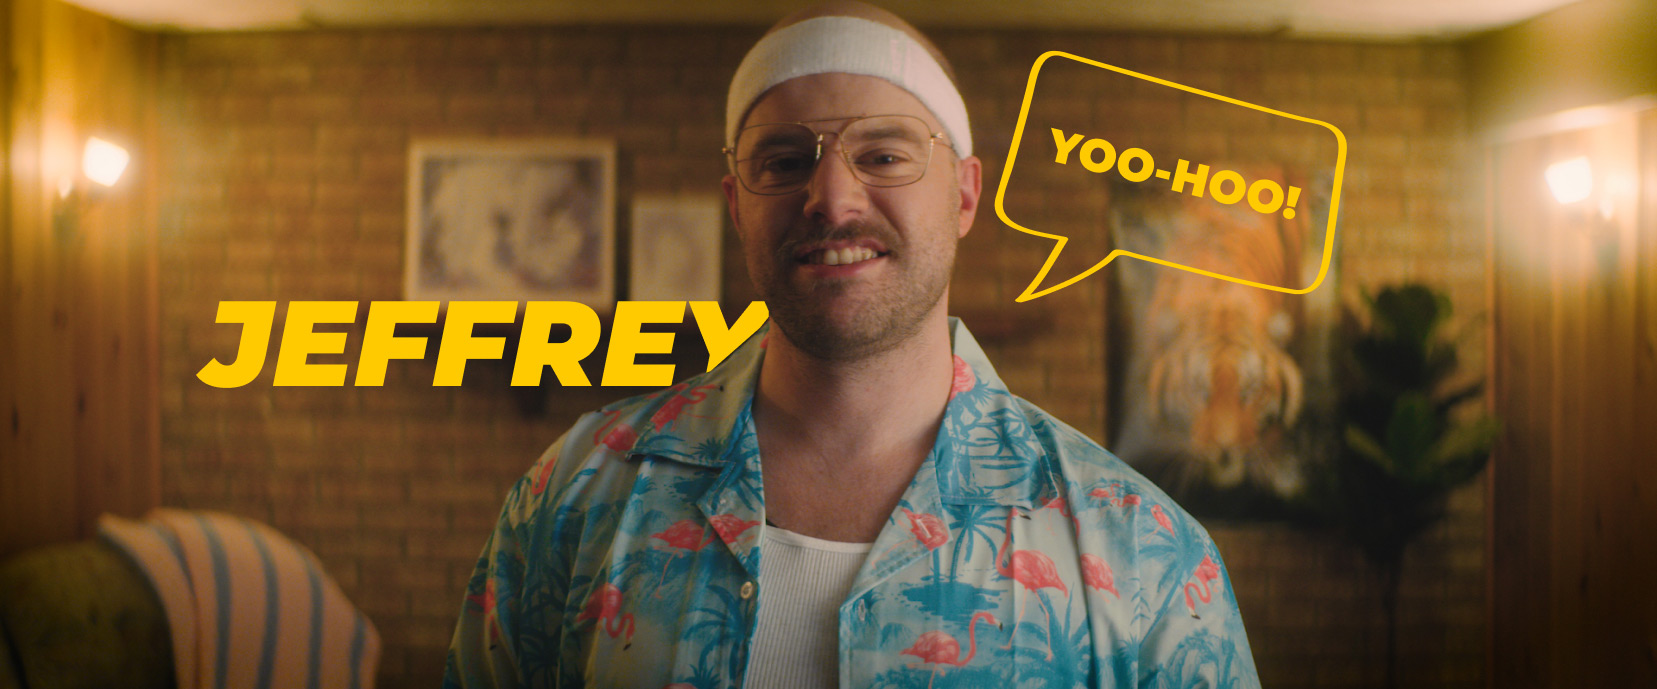 Yoo-hoo it's me, Jeffrey